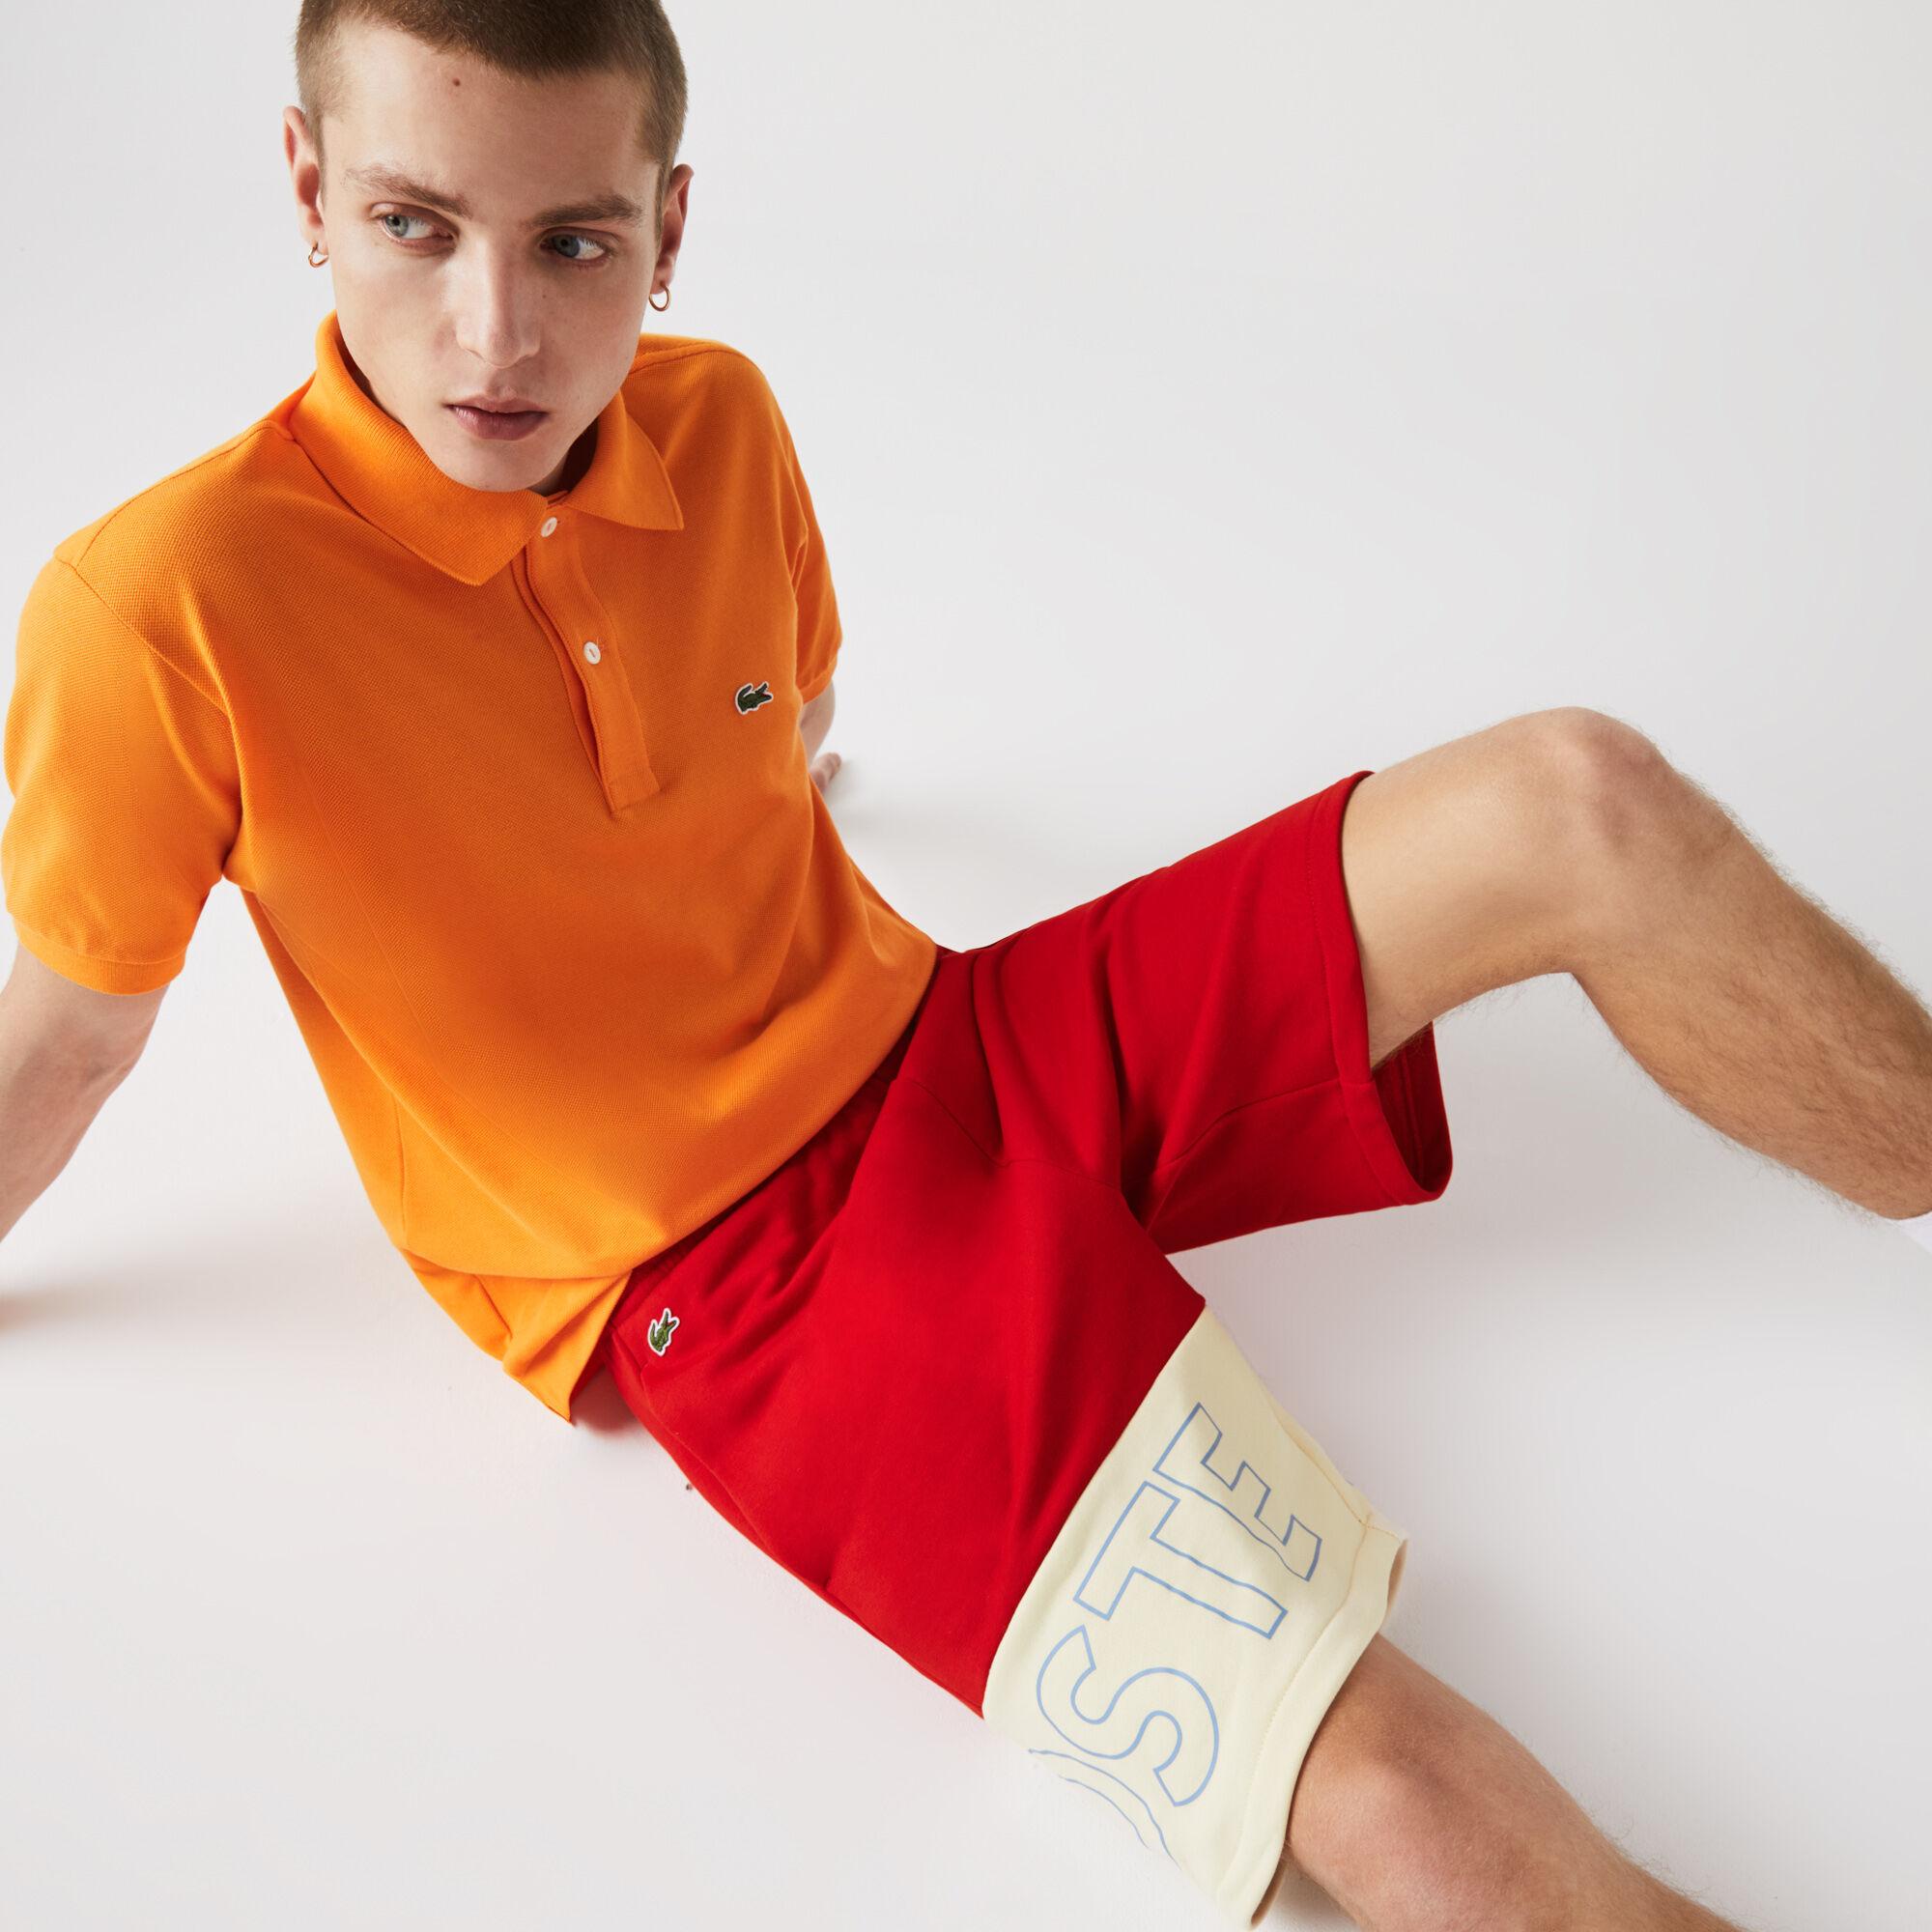 Men's Lettered Colorblock Fleece Shorts